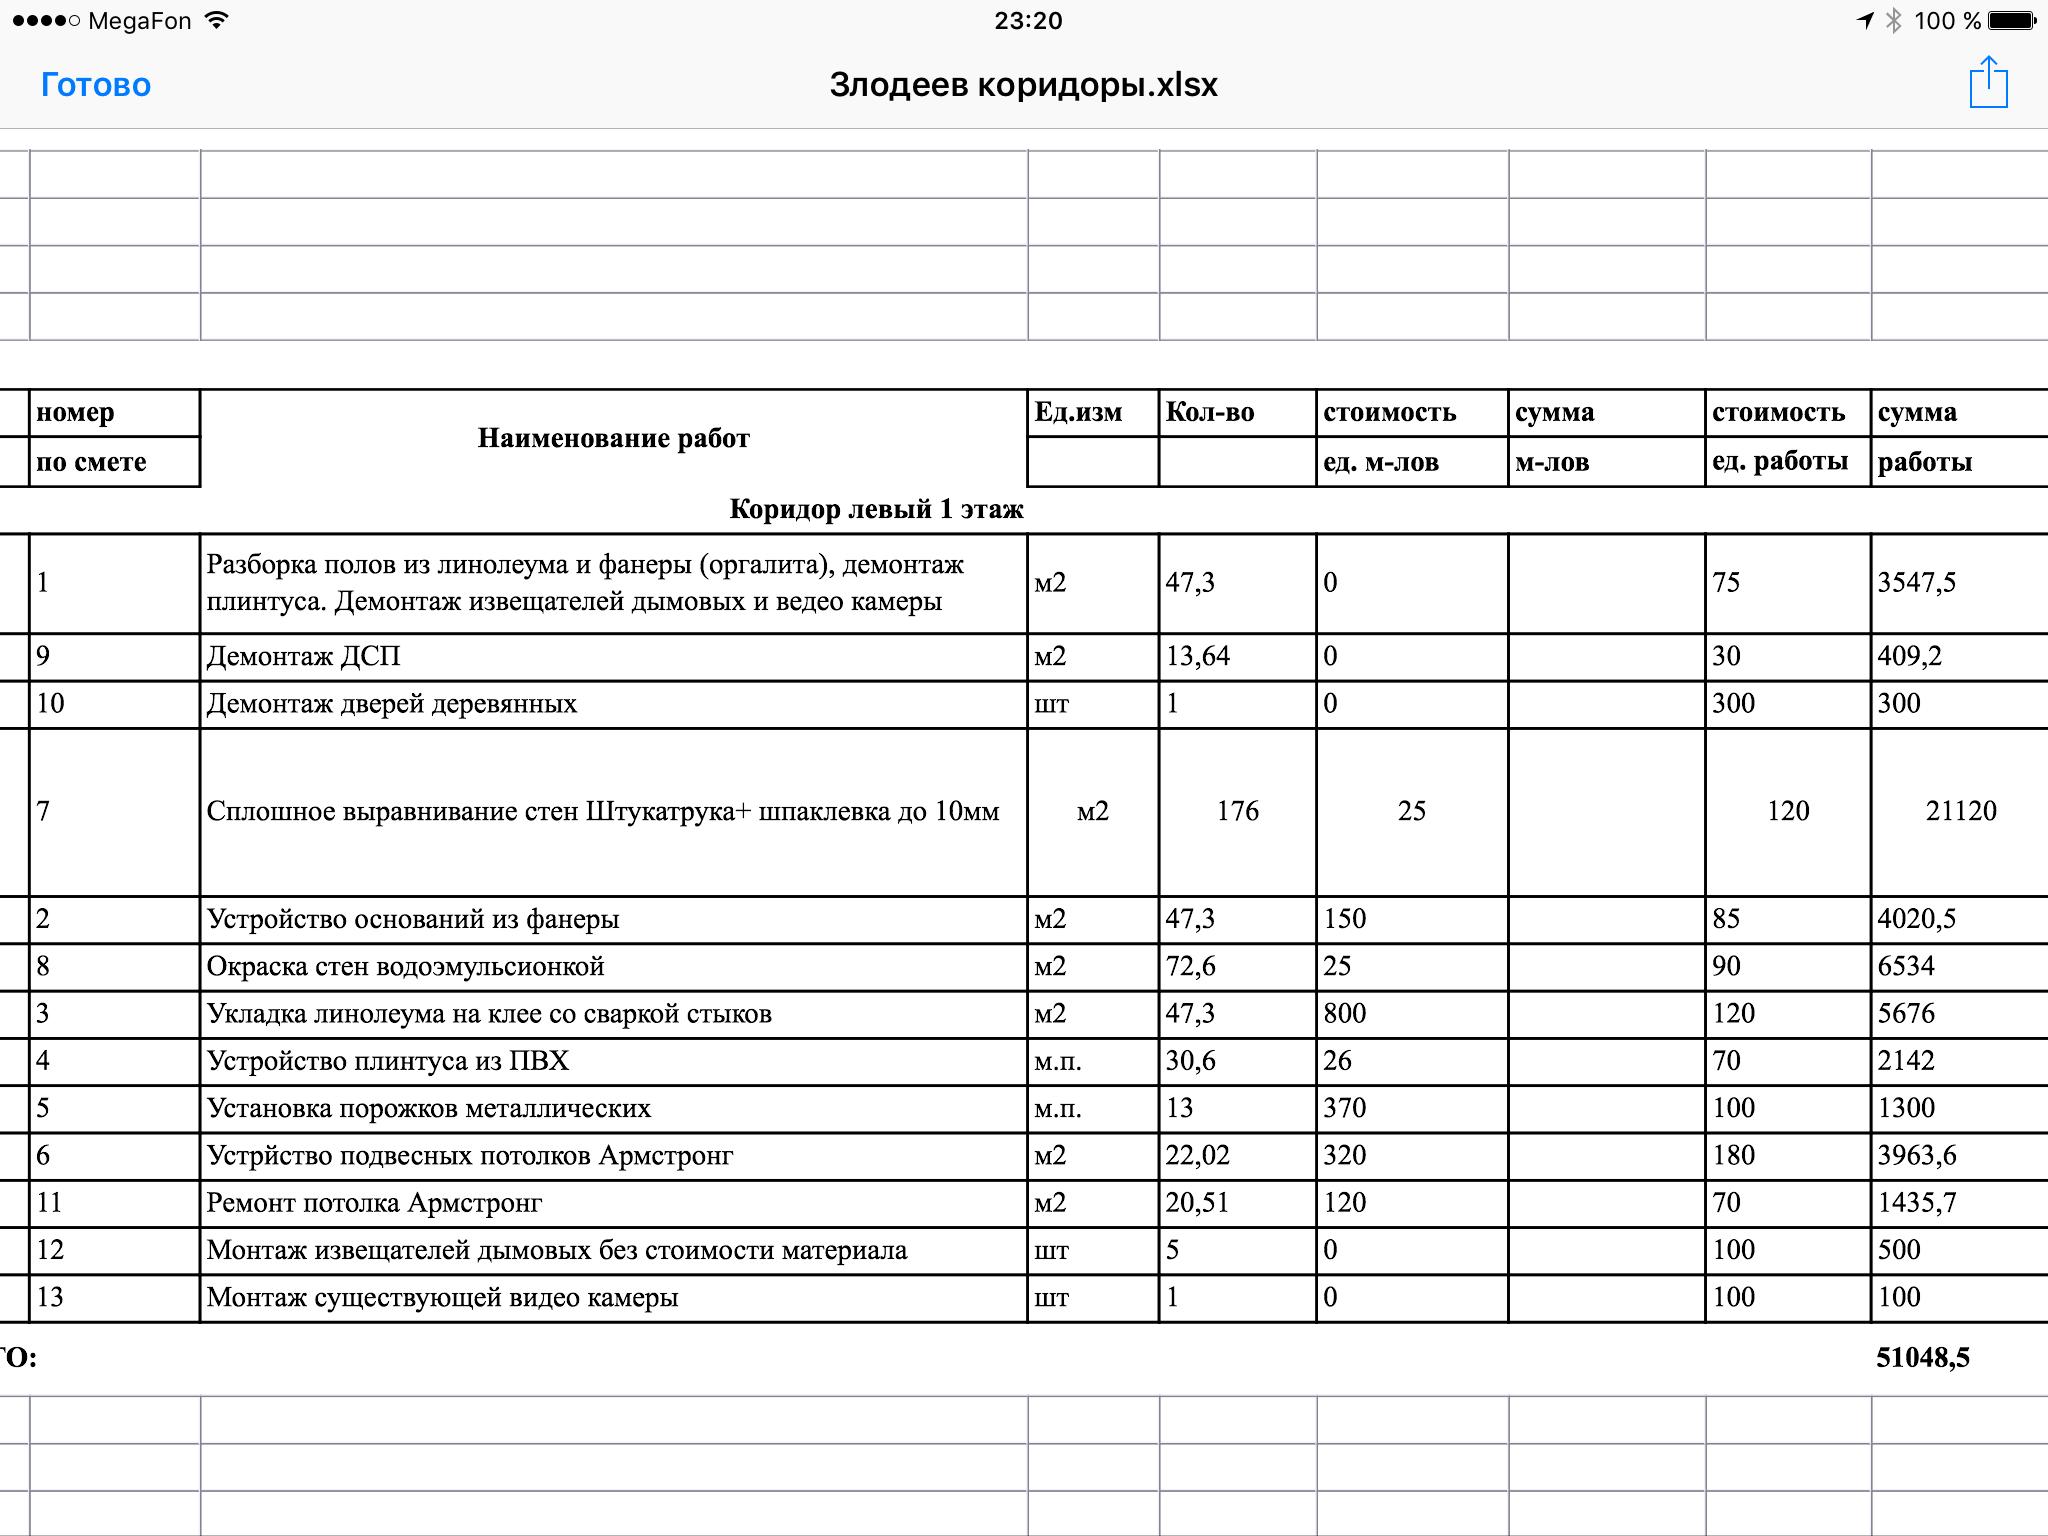 Демонтаж потолка армстронг: расценки и цены за м²